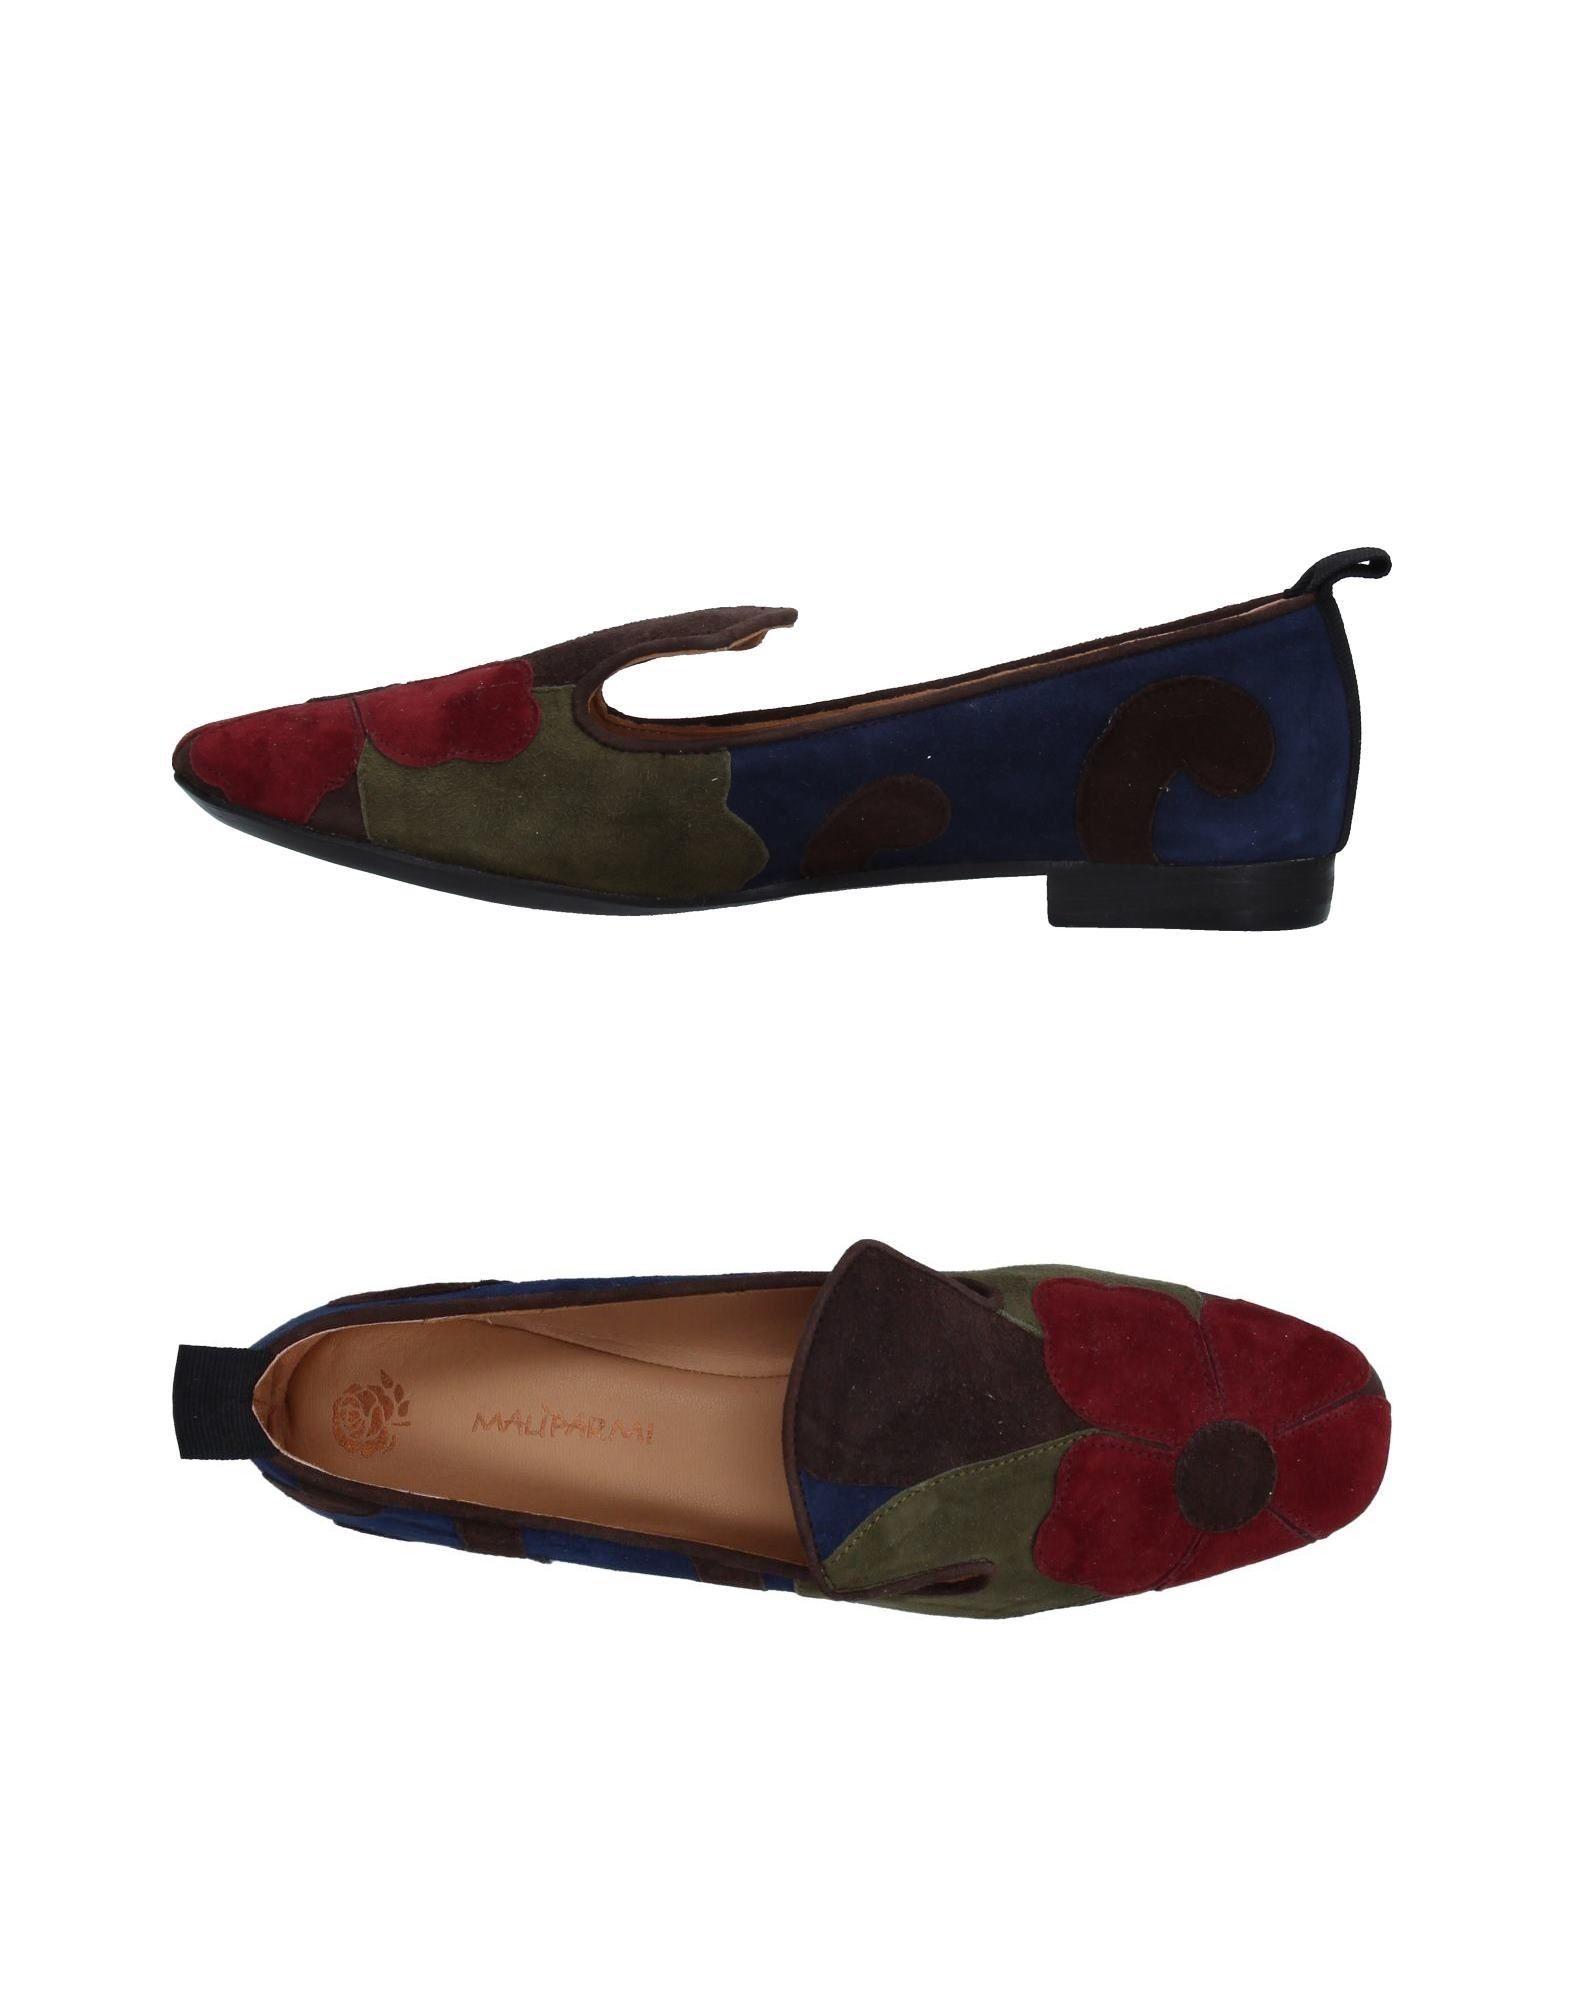 Stilvolle billige Schuhe Malìparmi Mokassins Damen  11265196DR